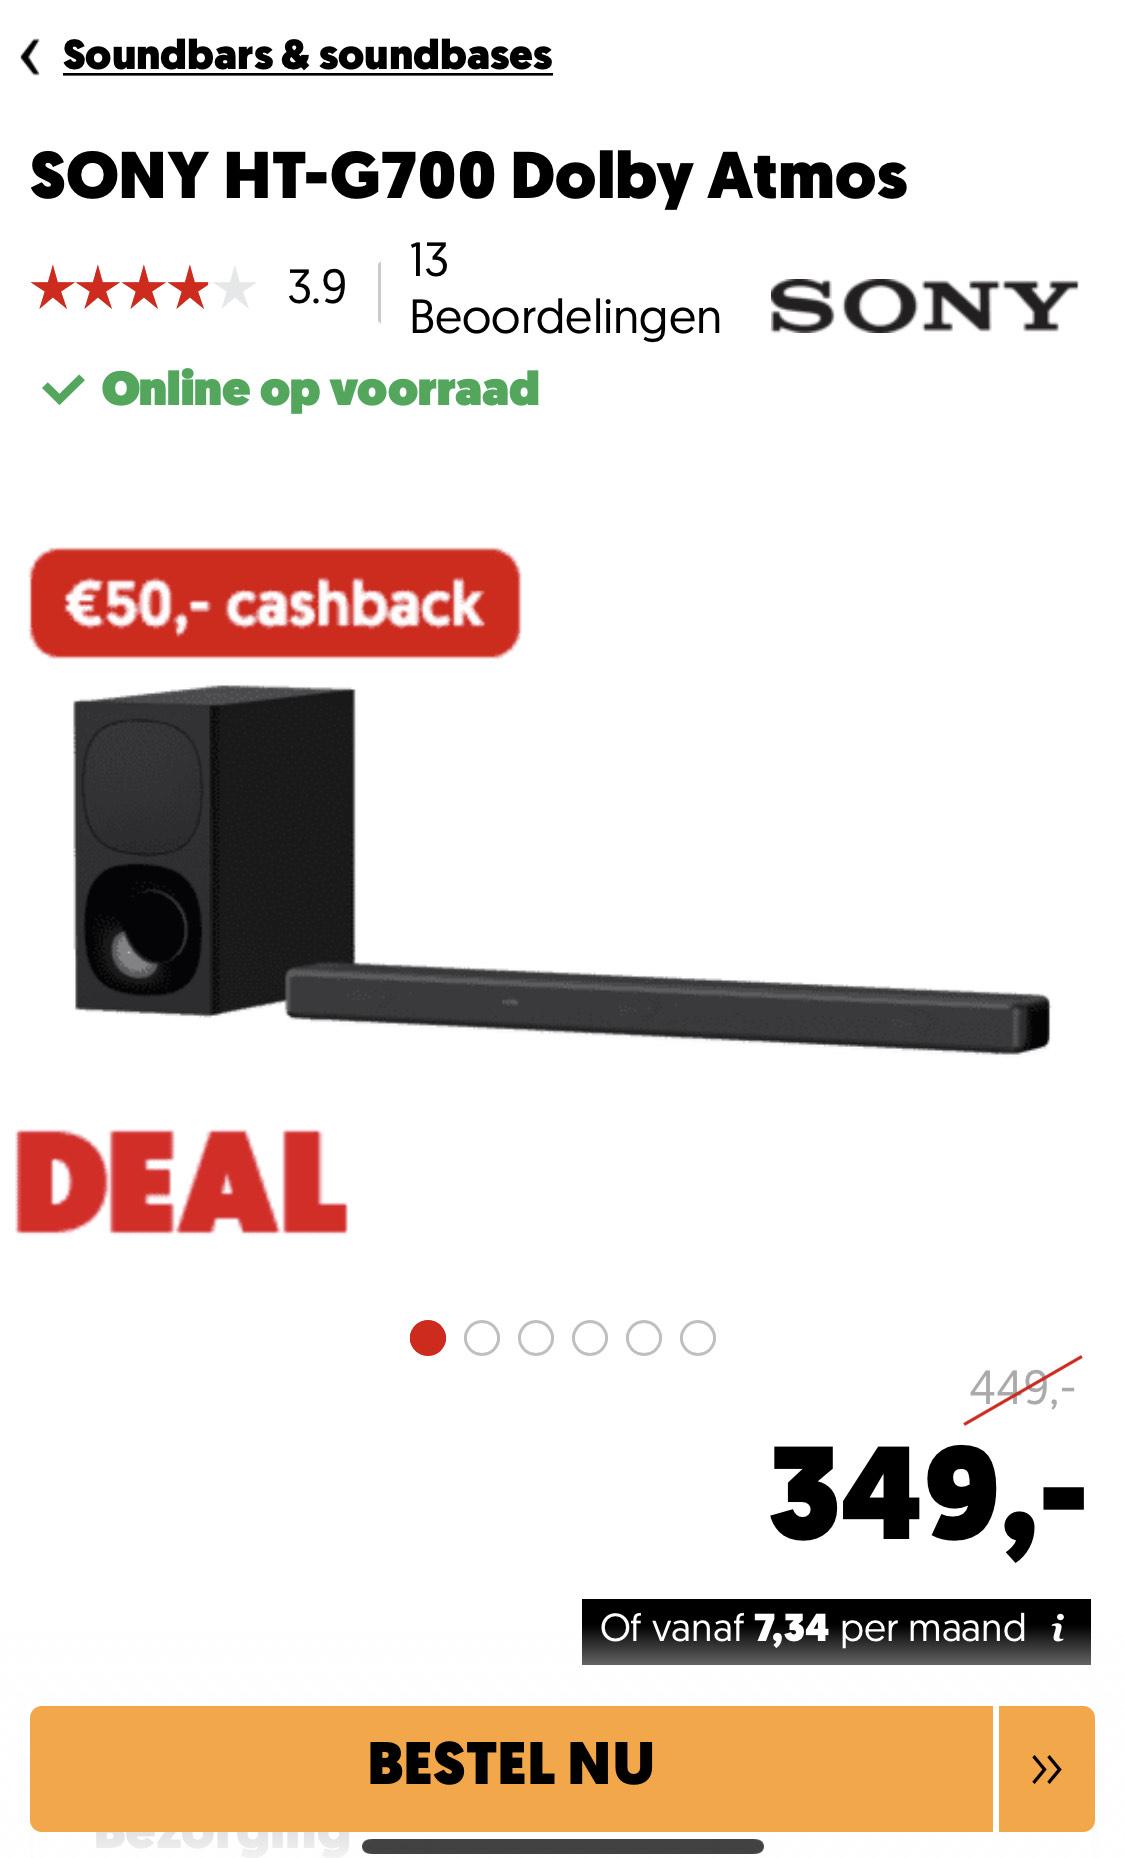 Sony ht-g700 3.1 dolby Atmos soundbar